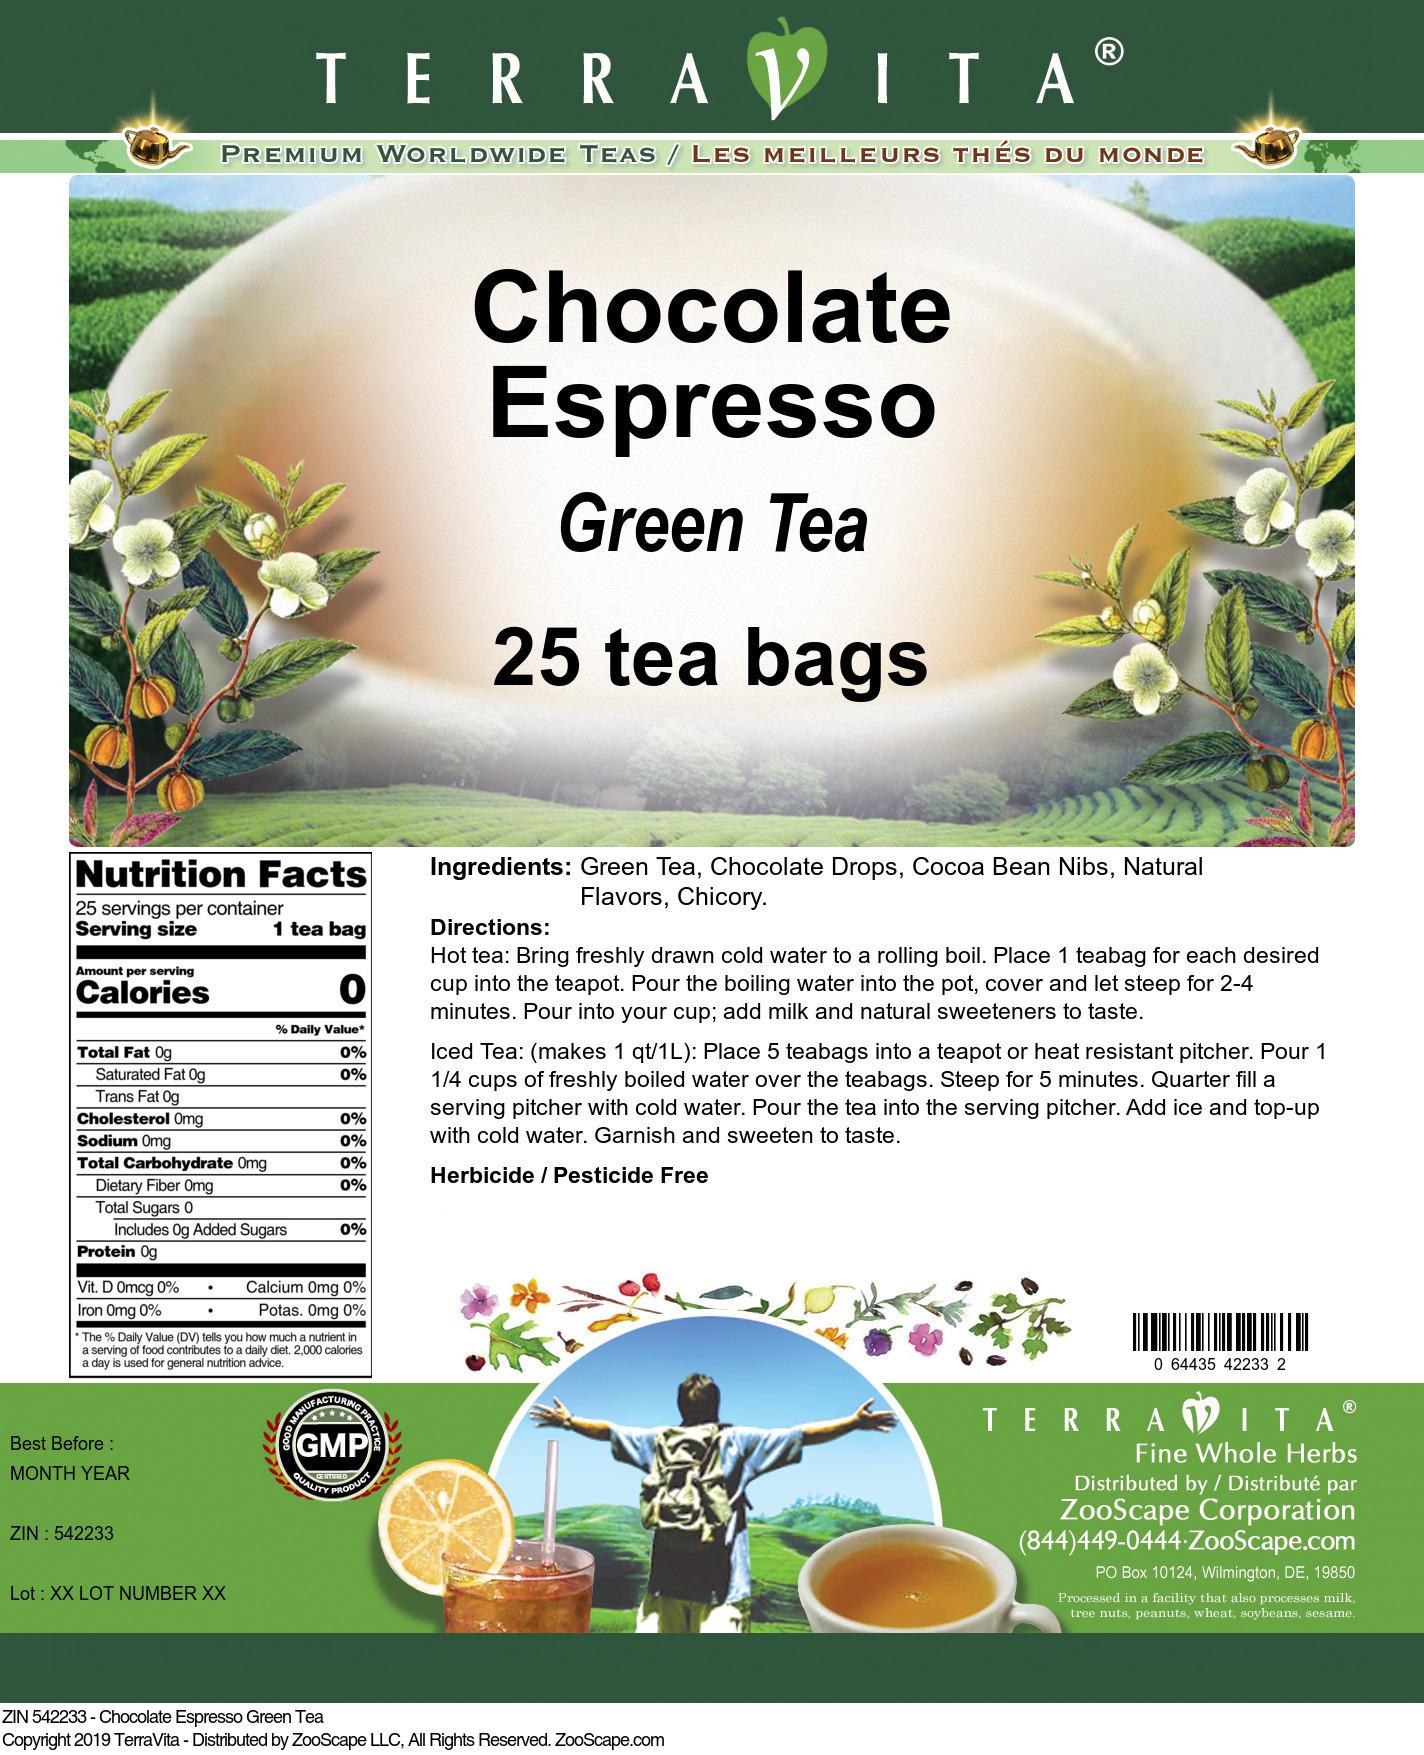 Chocolate Espresso Green Tea